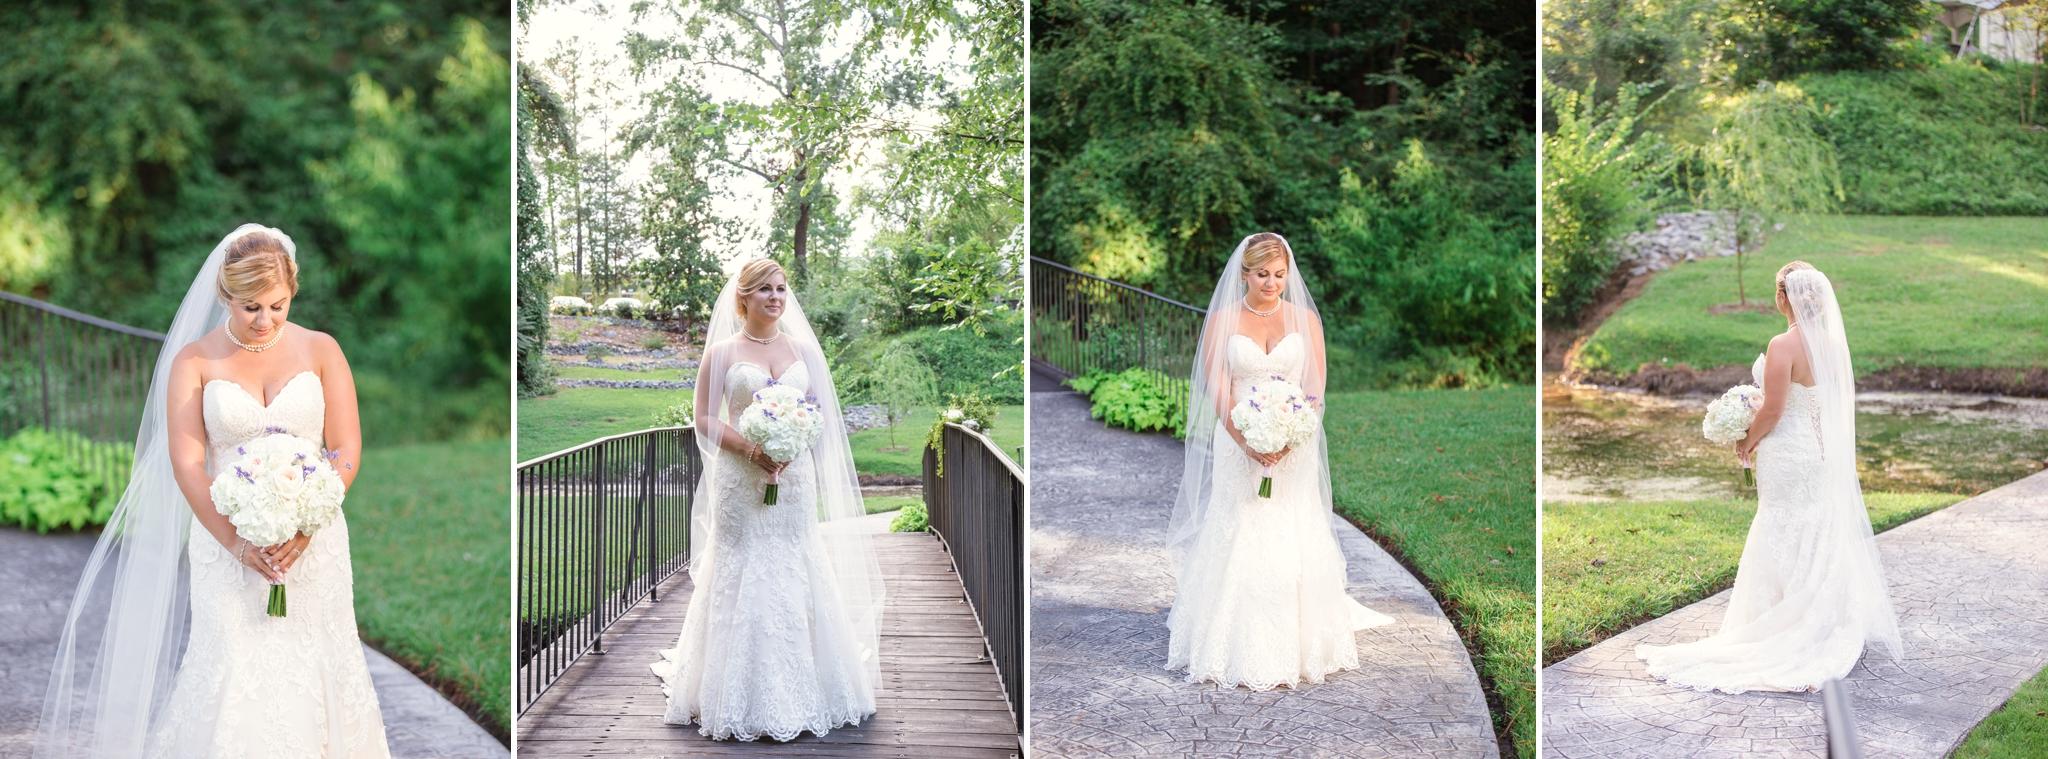 Wedding Photography at Vizcaya Villa in Fayetteville North Carolina